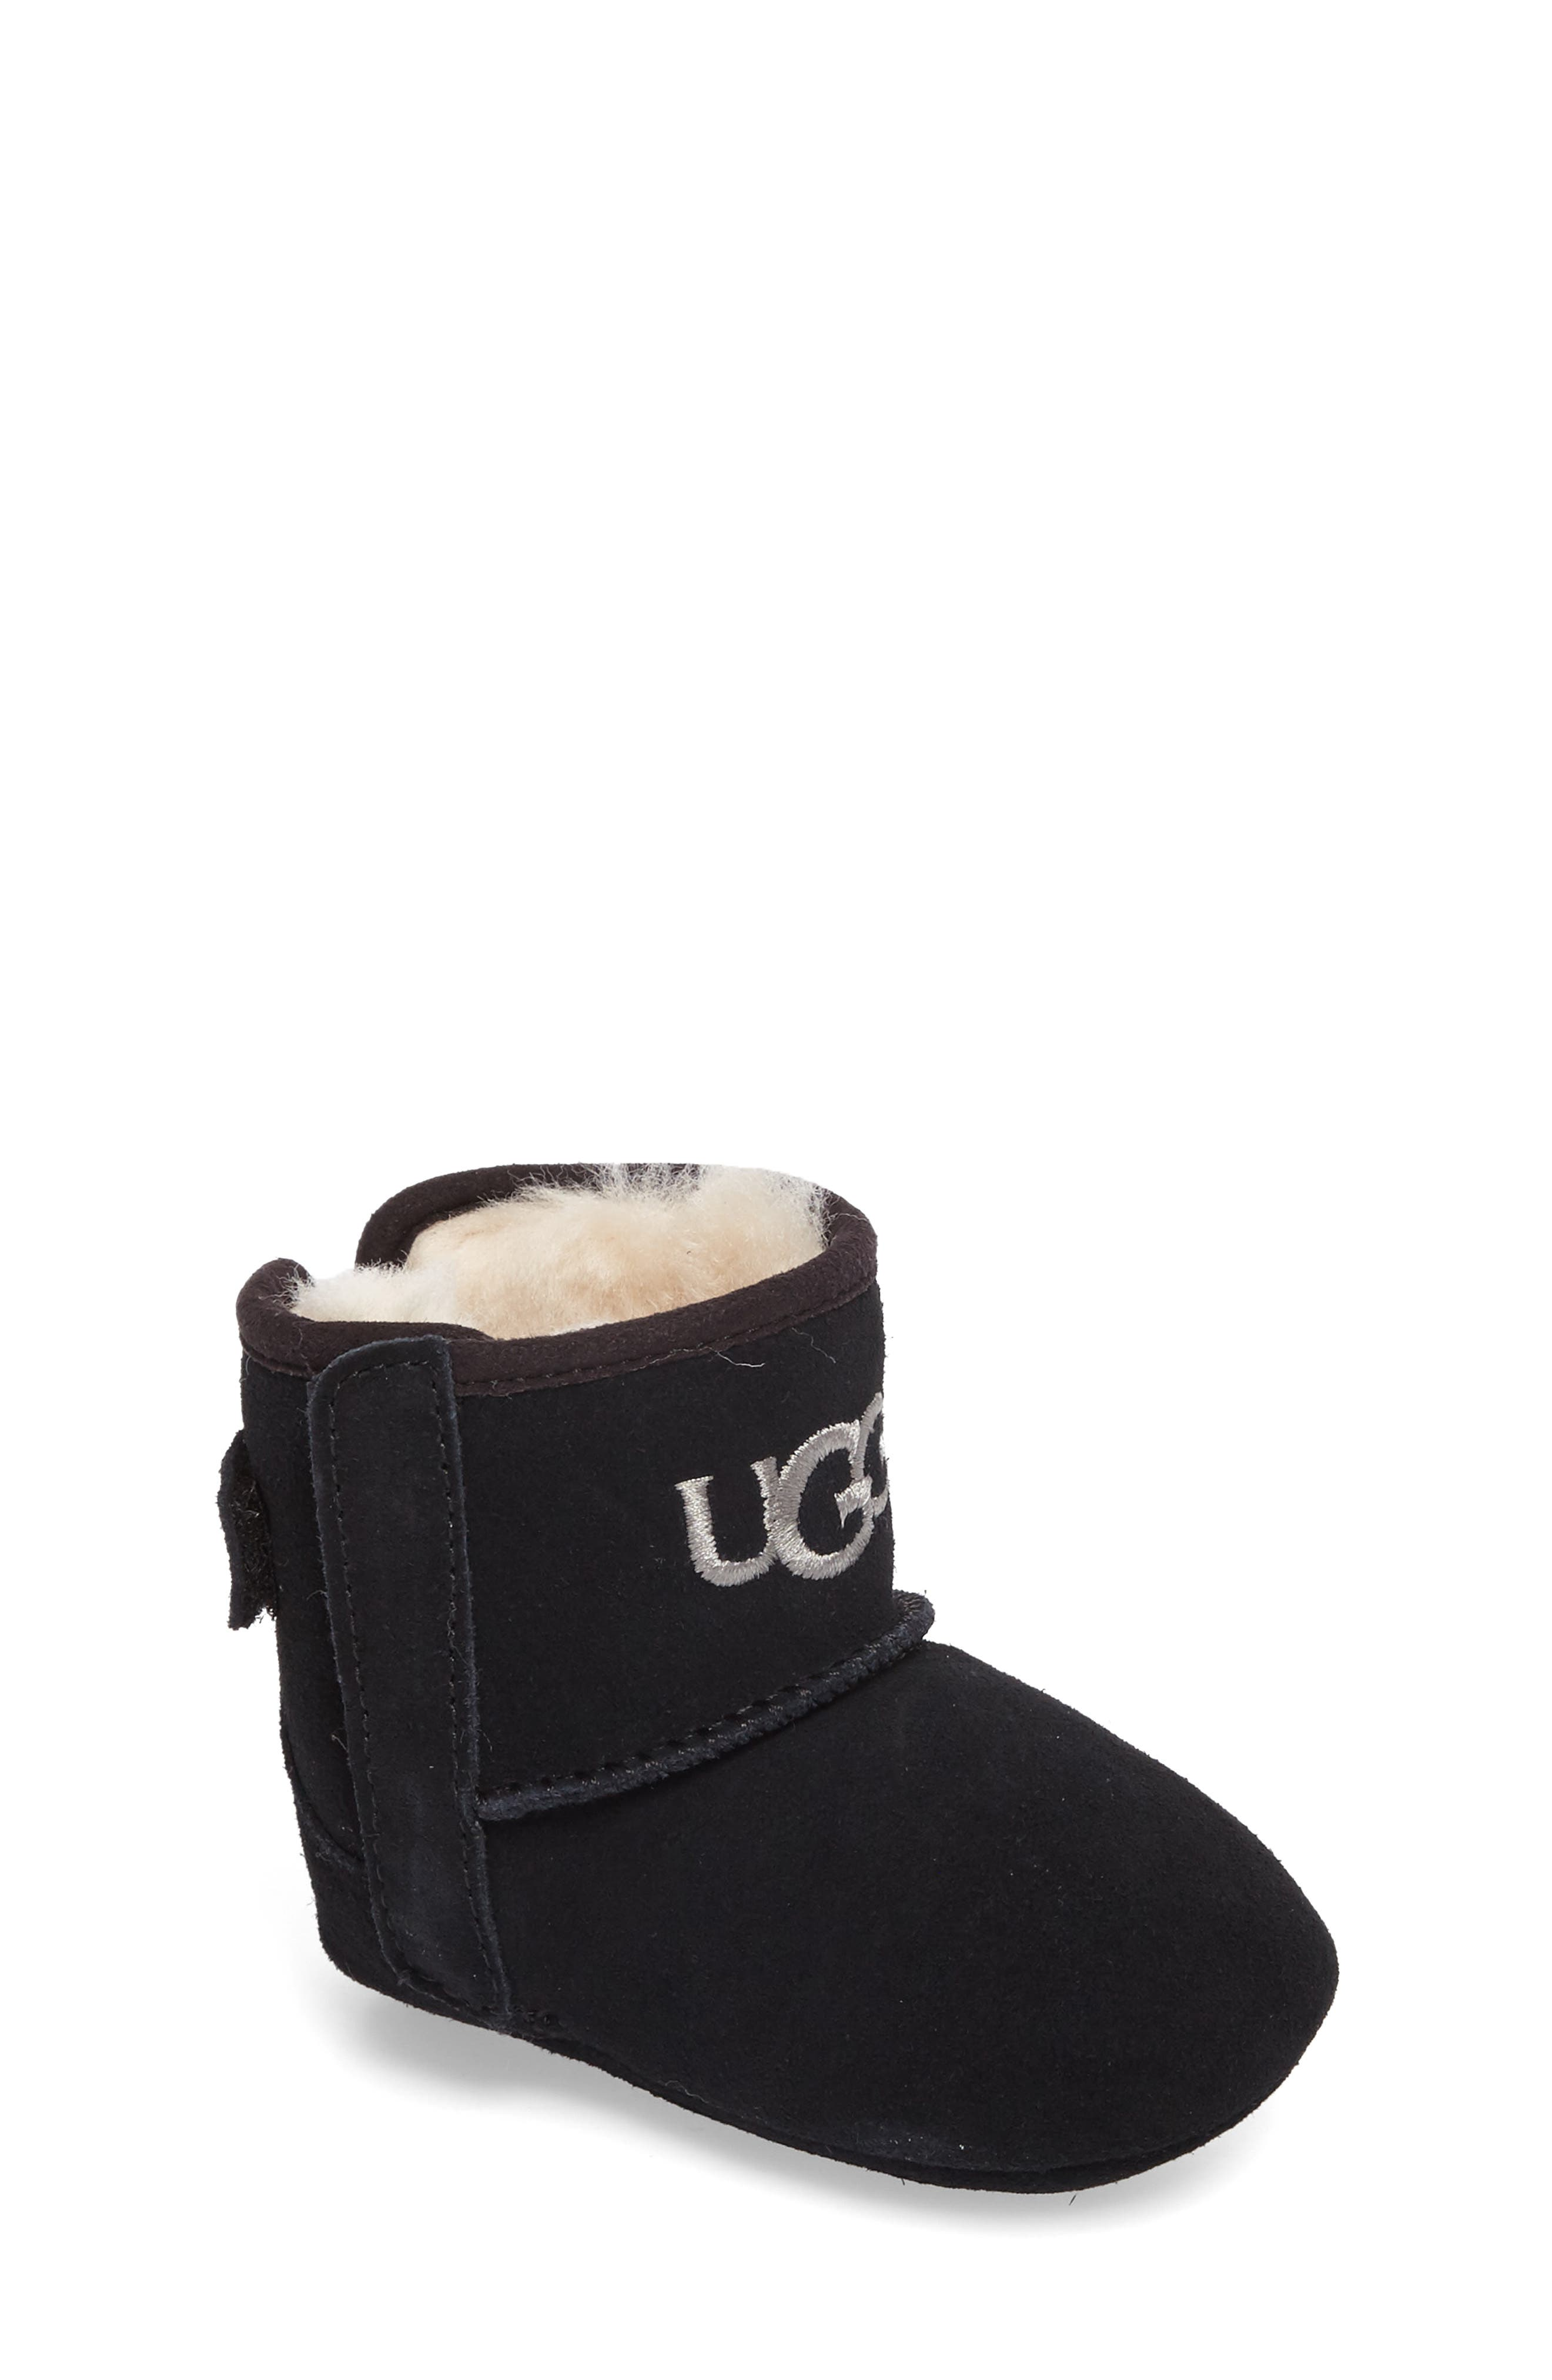 Alternate Image 1 Selected - UGG® Jesse II Bow Boot (Baby & Walker)